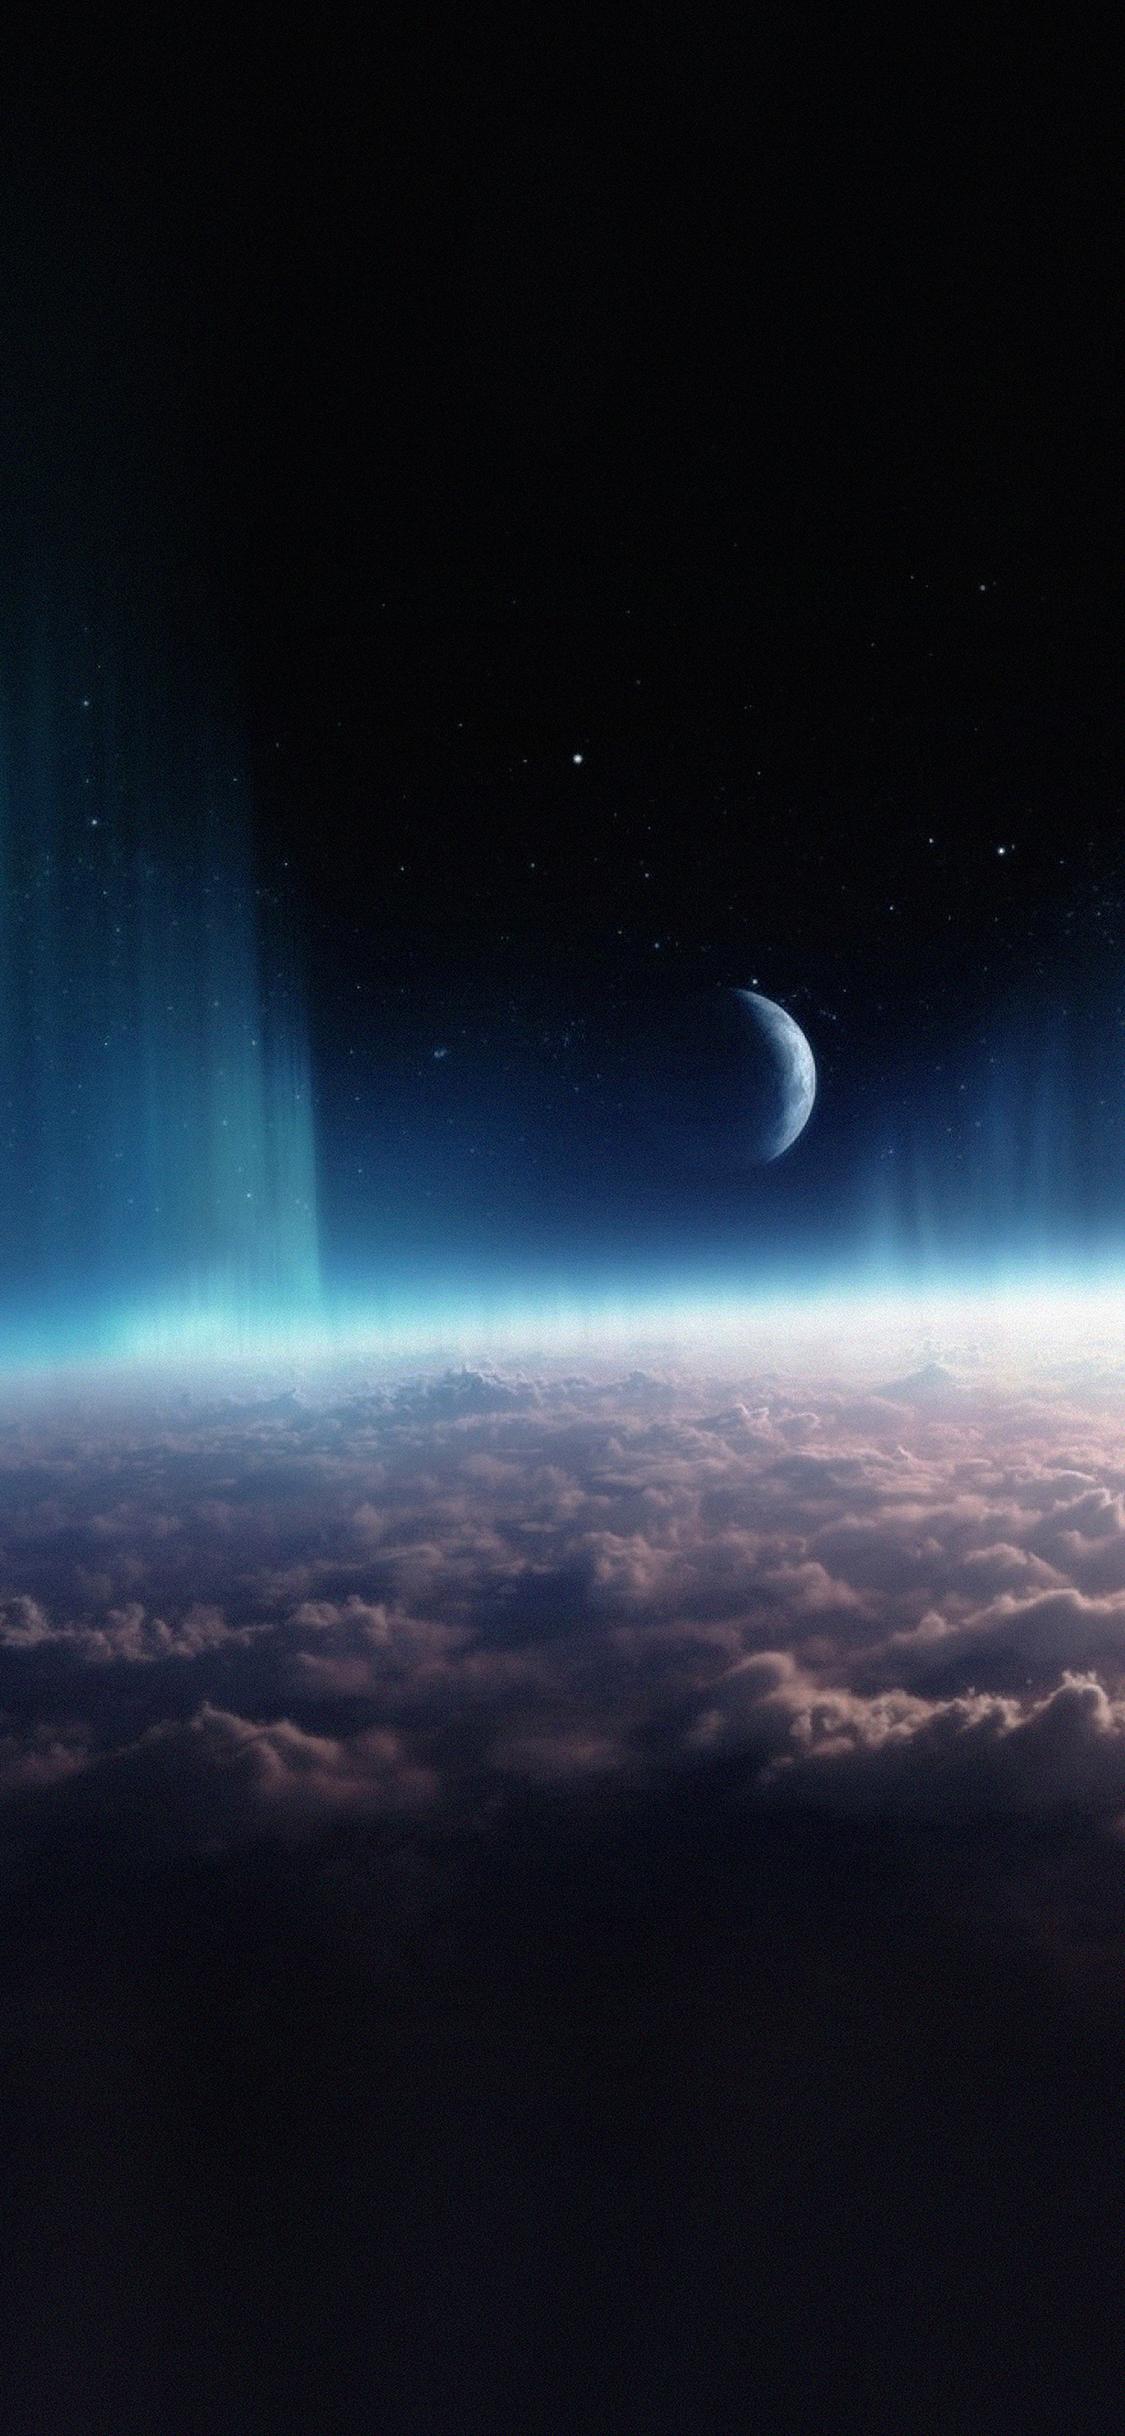 iPhoneXpapers.com-Apple-iPhone-wallpaper-mj69-space-interstellar-sky-cloud-nature